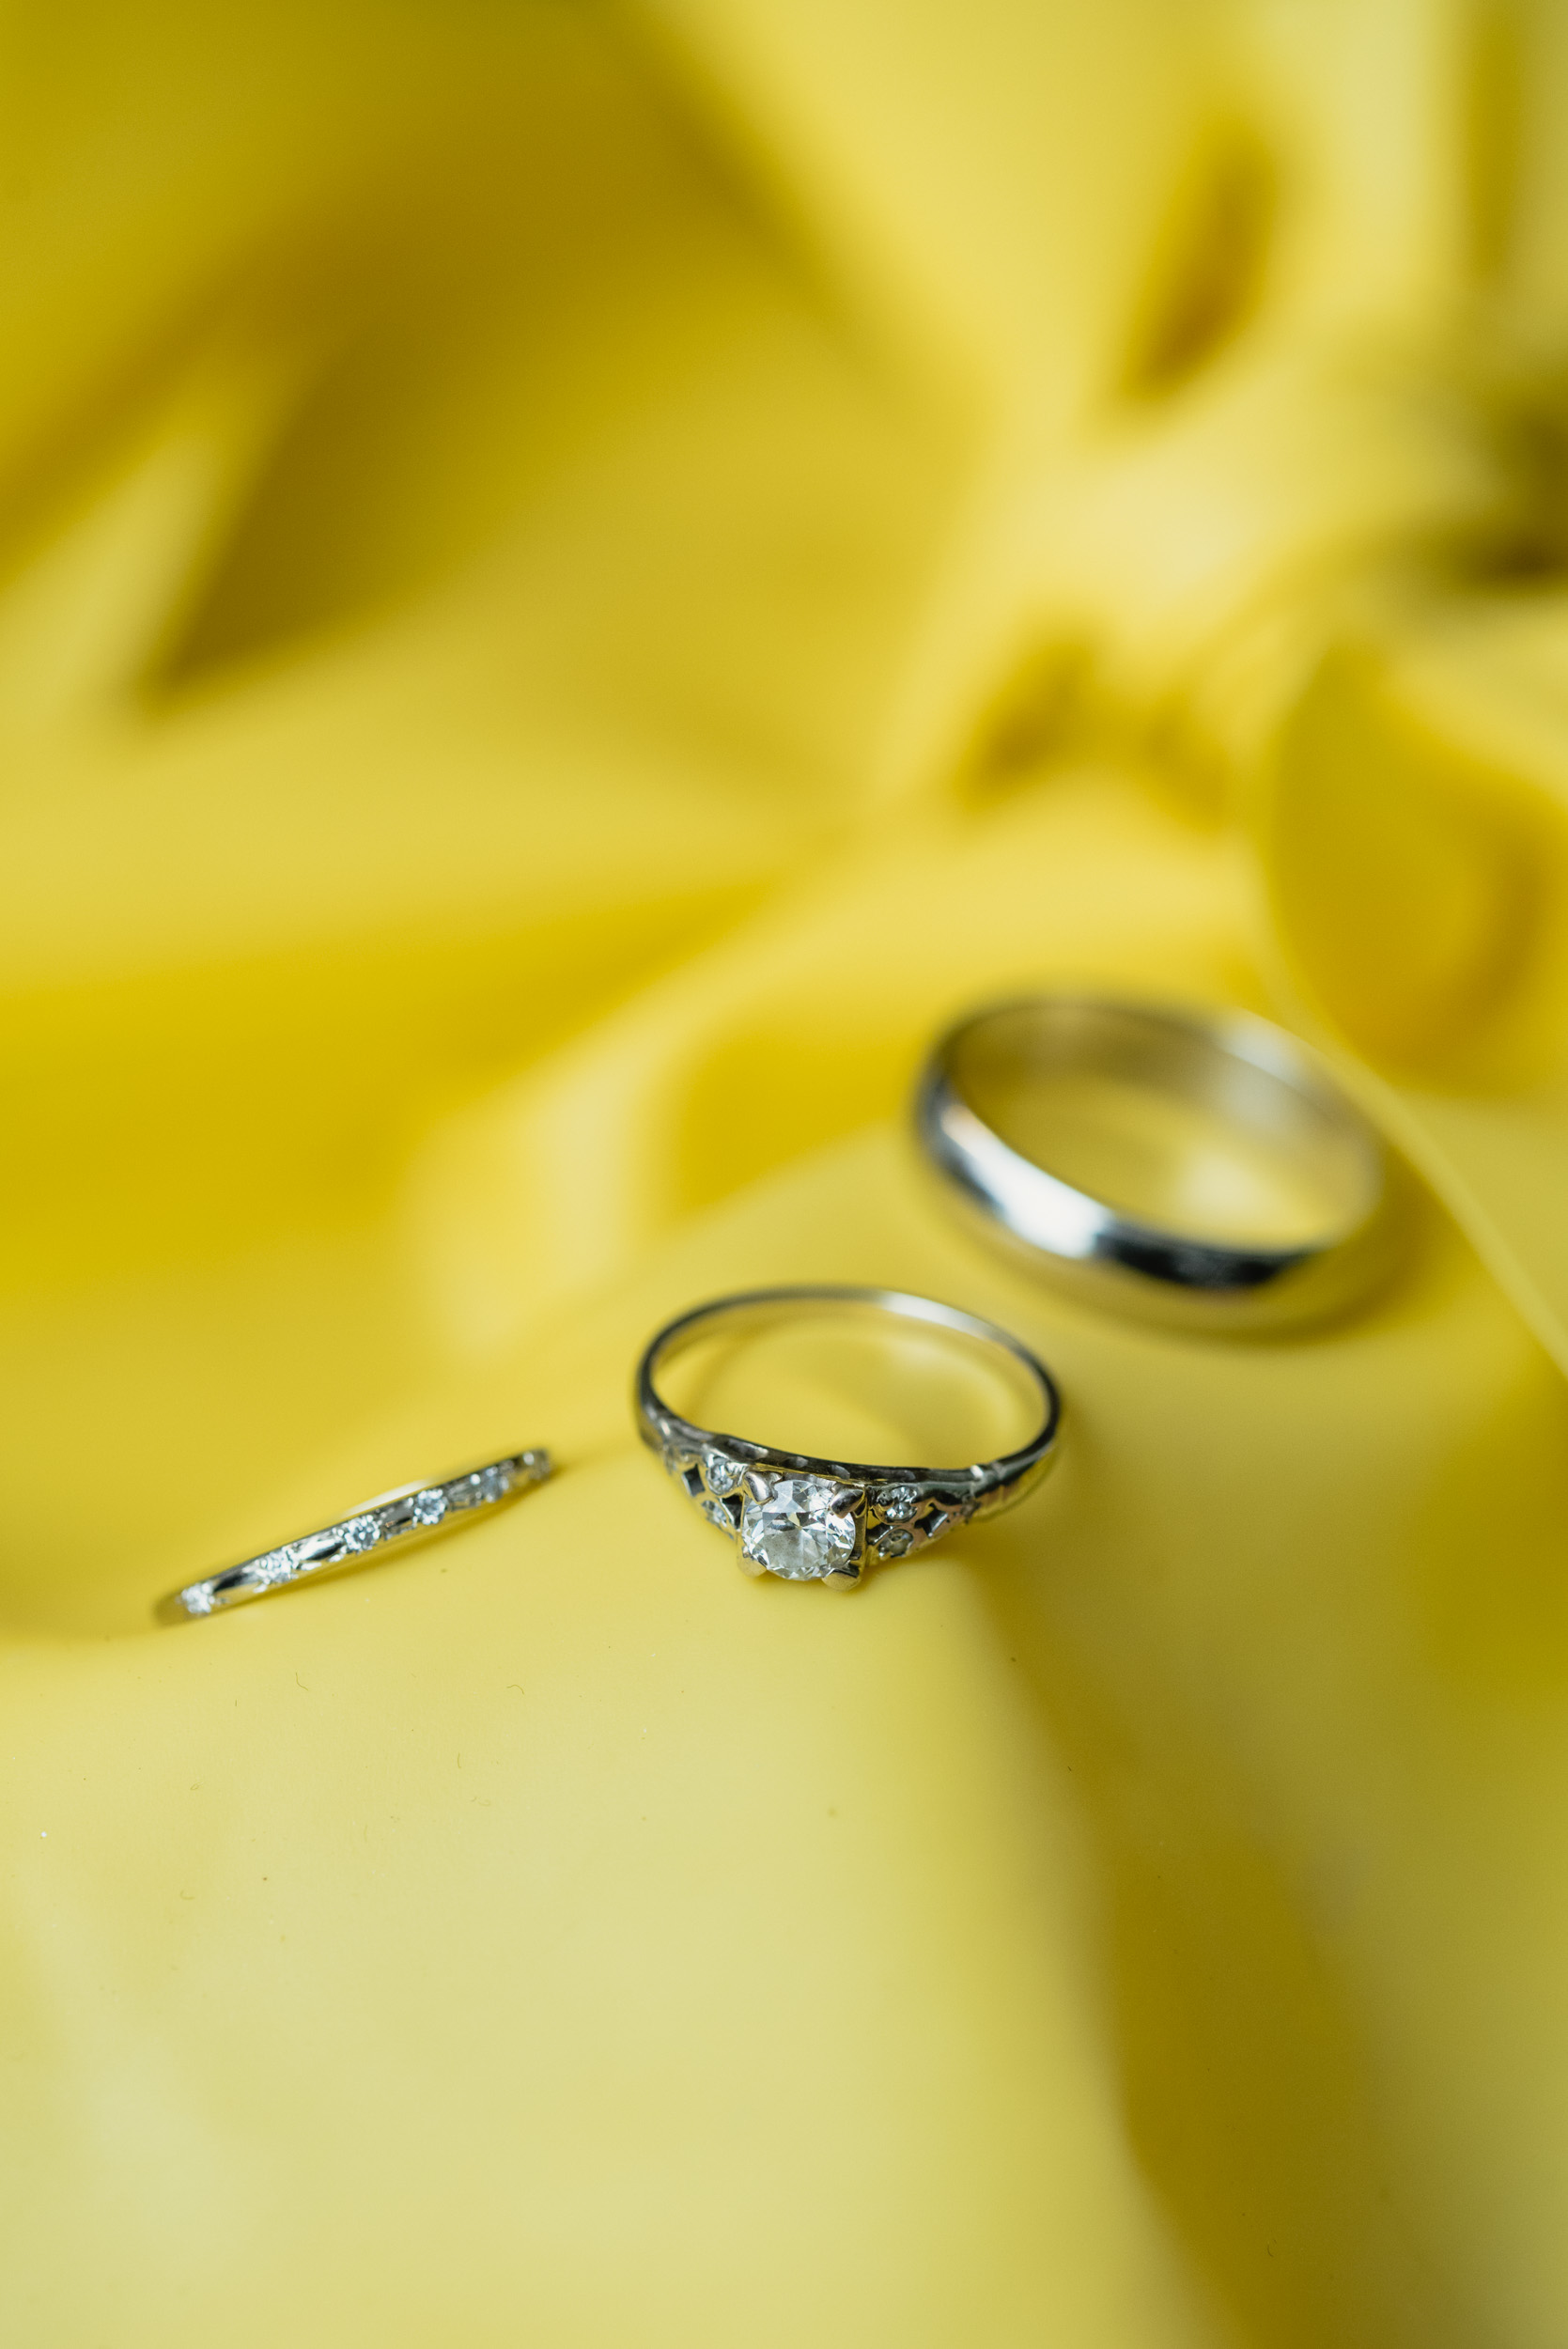 Wedding rings on yellow background